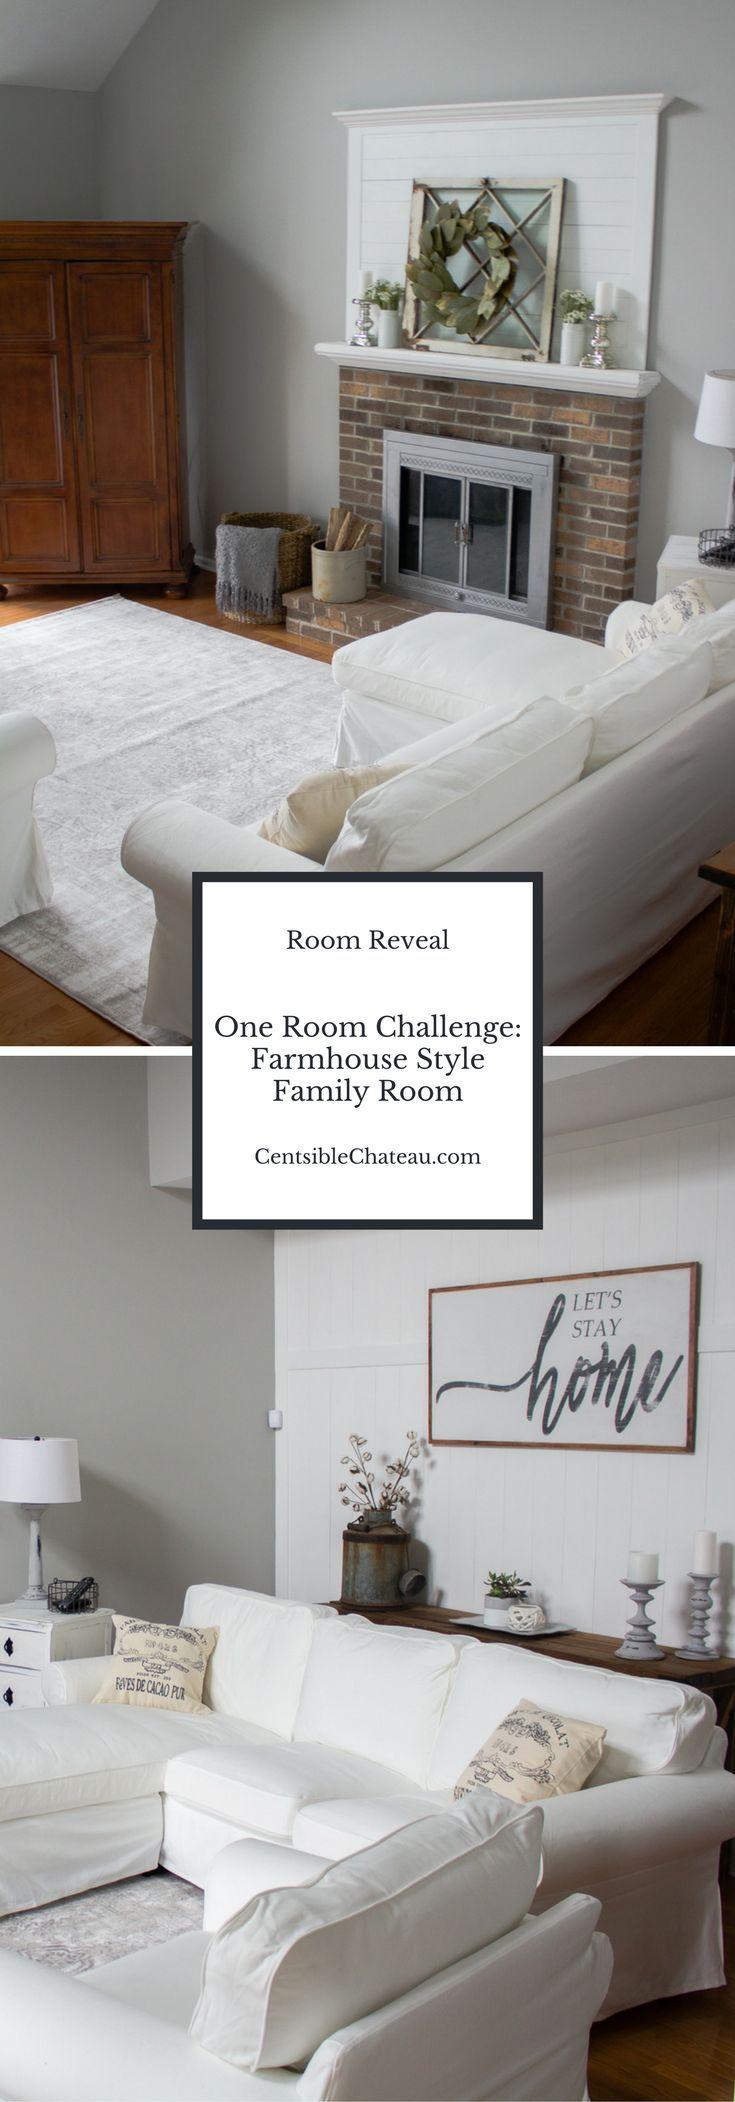 114 besten Home Decor: Living Room Bilder auf Pinterest ...